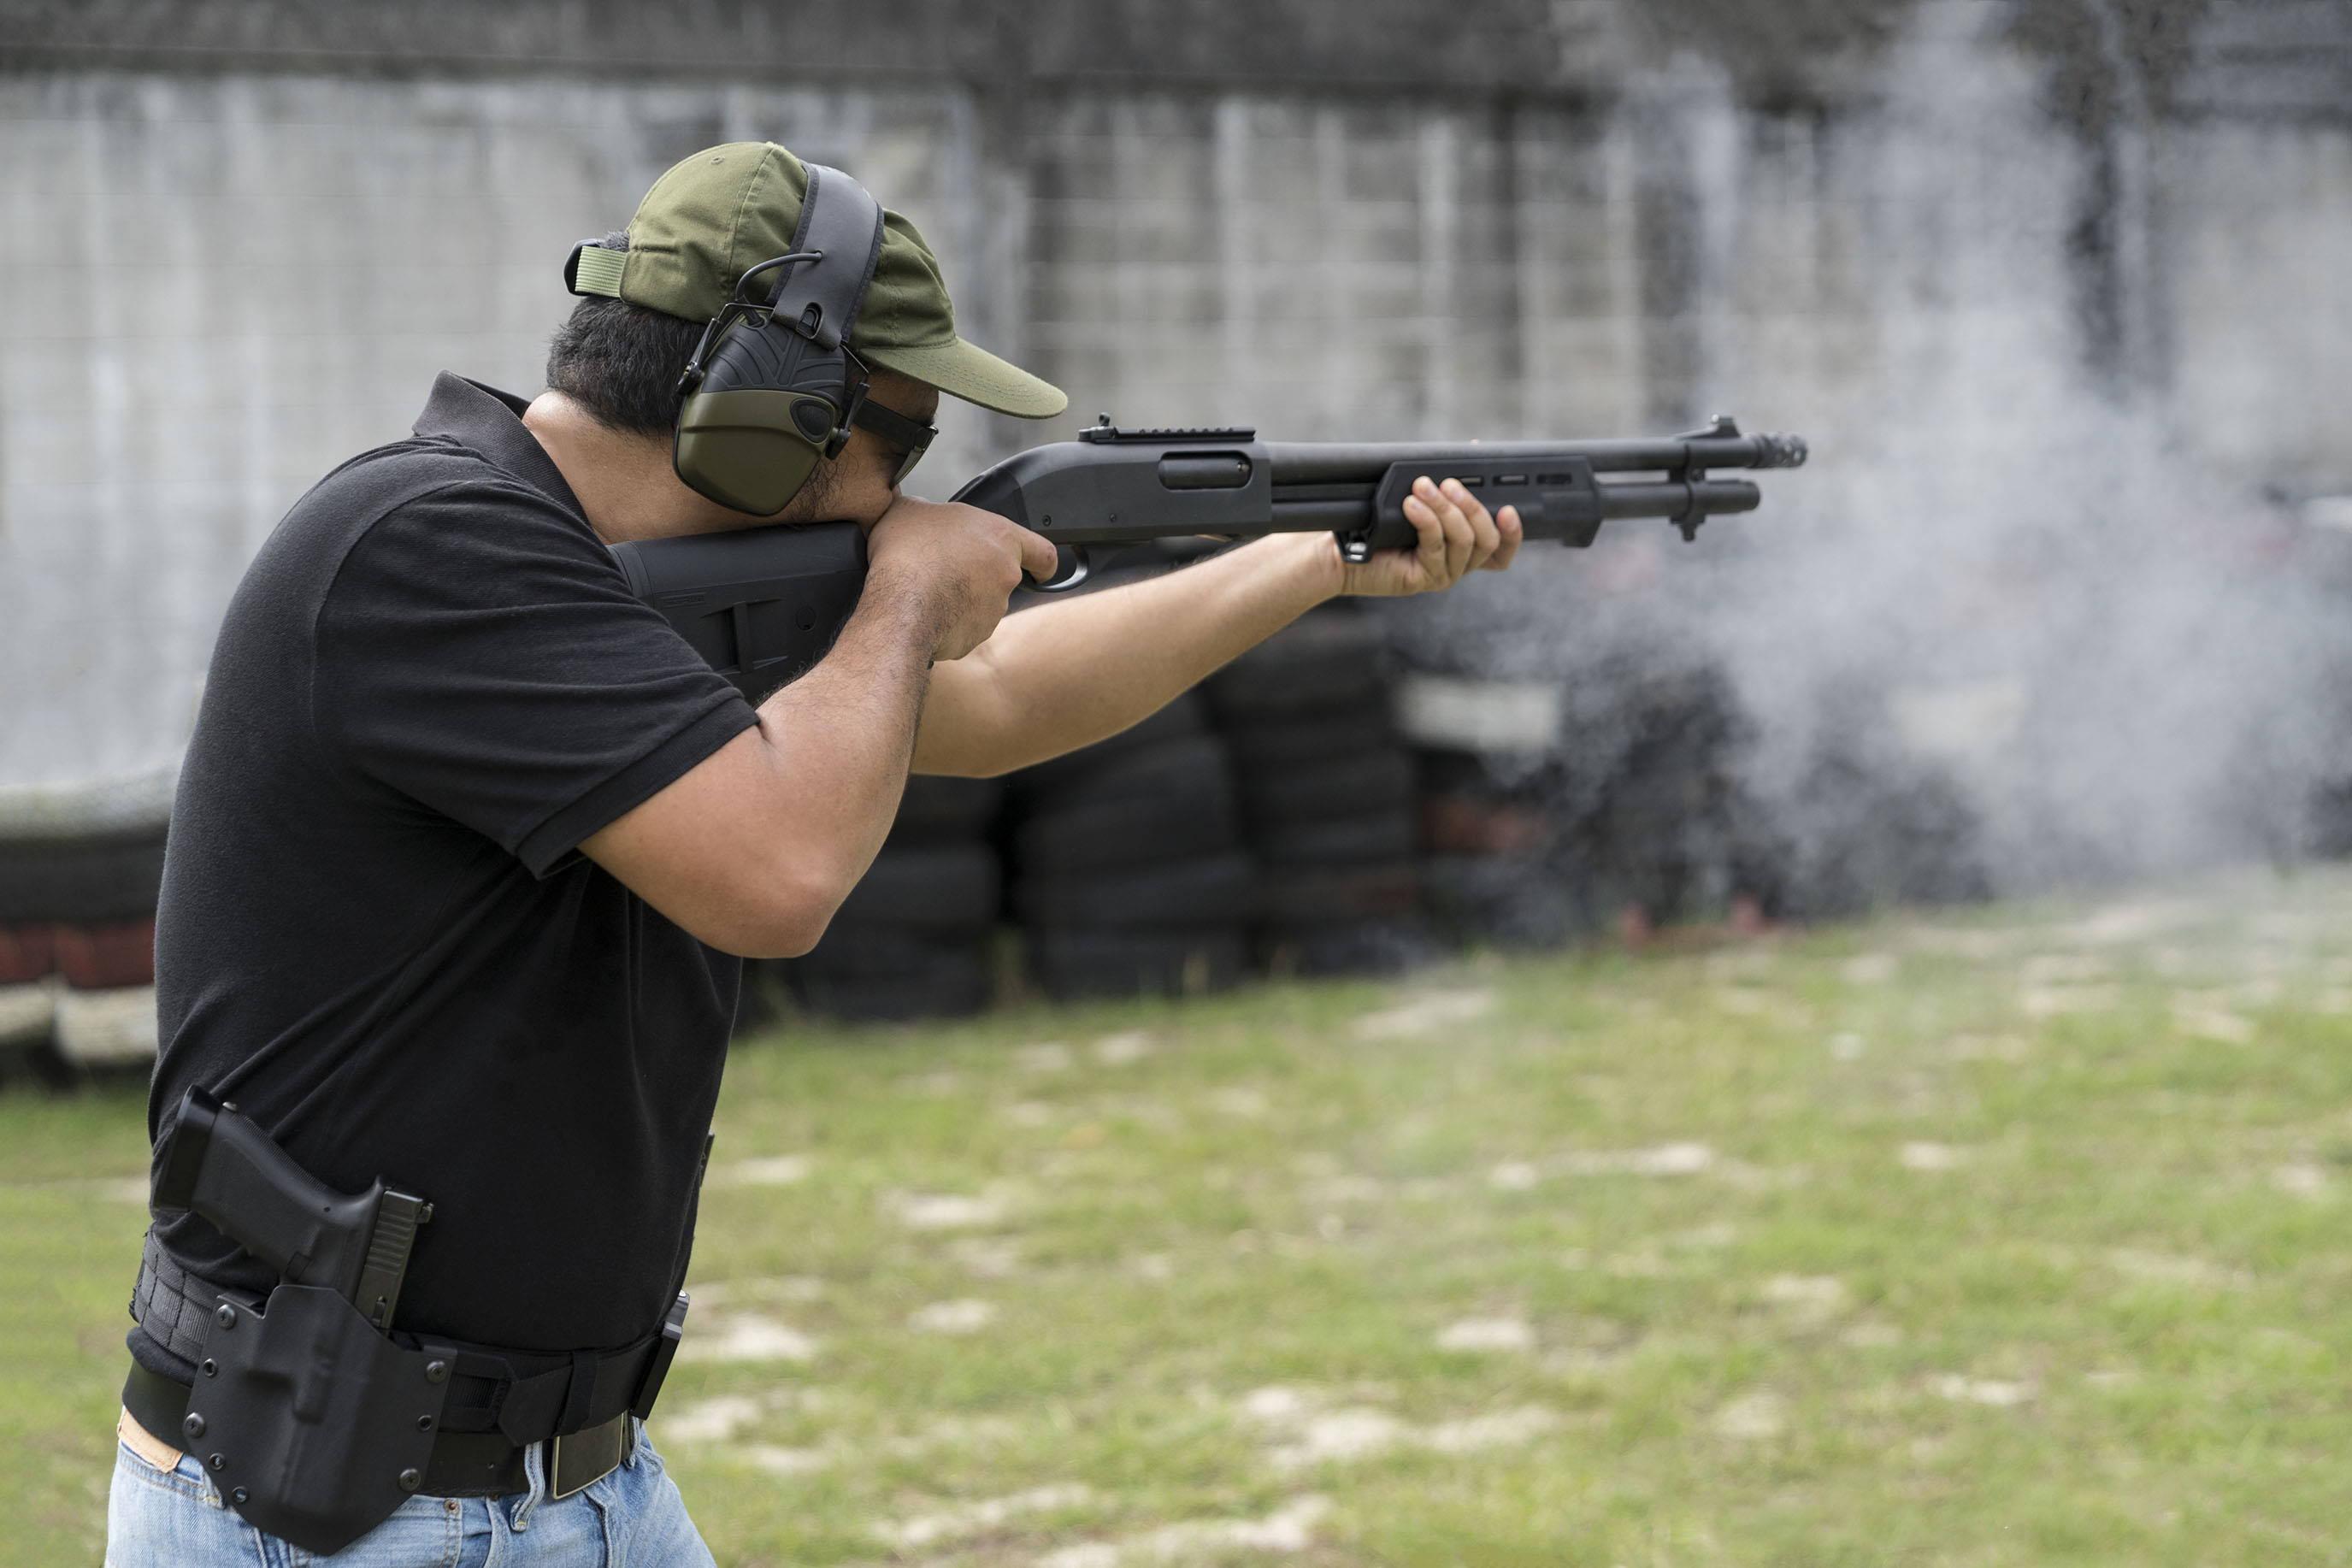 Training with a Shotgun